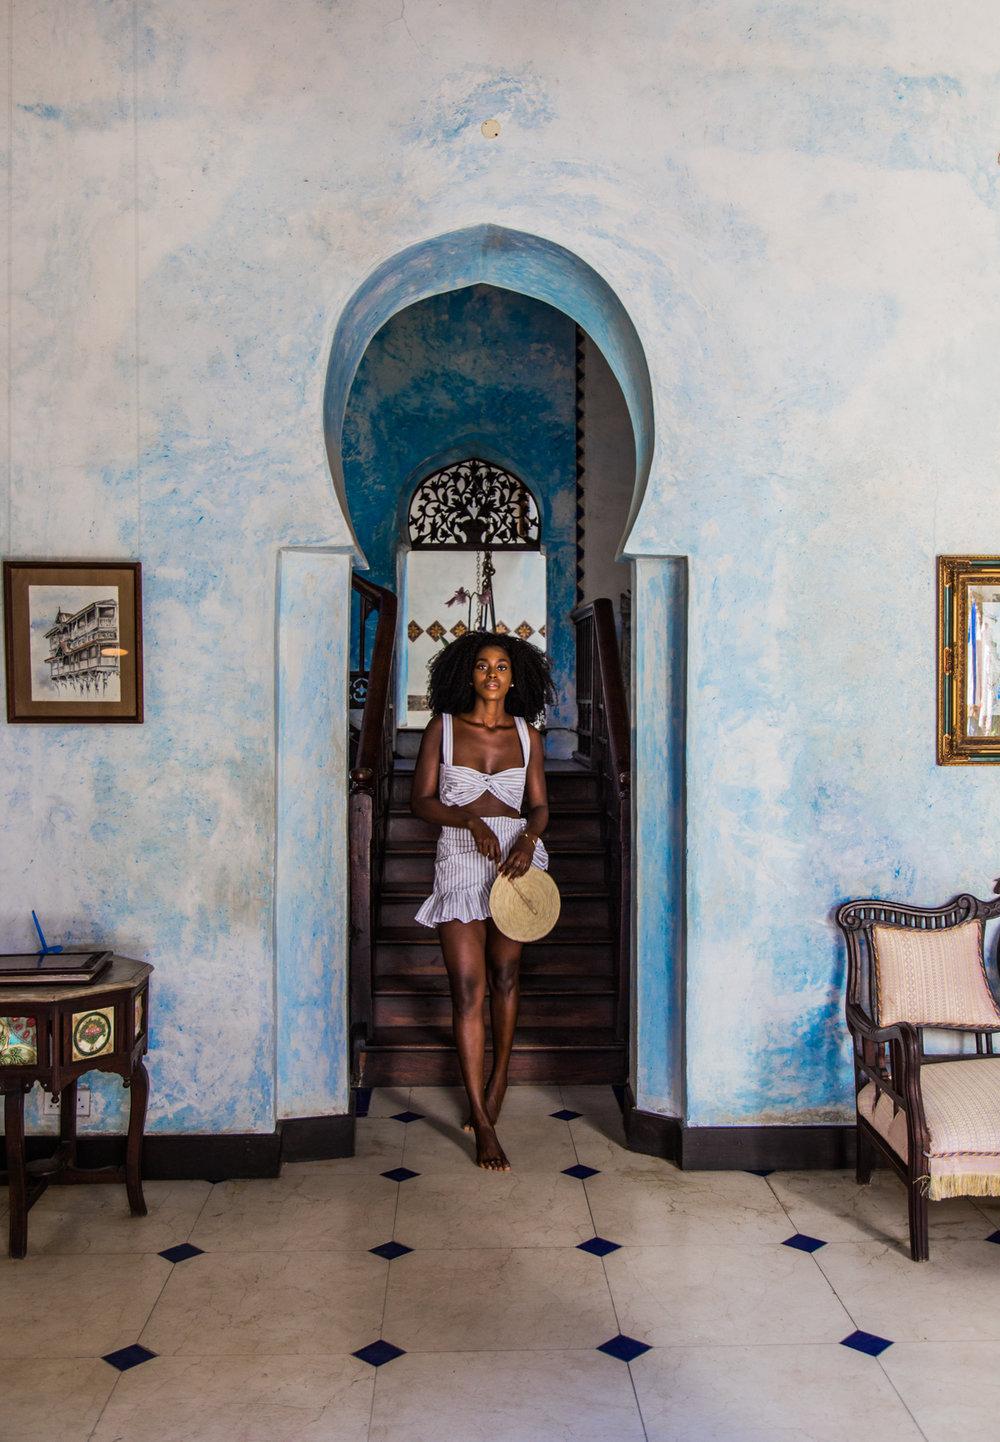 Spiritedpursuit_leelitumbe_emerson hotels_zanzibar-1.jpg